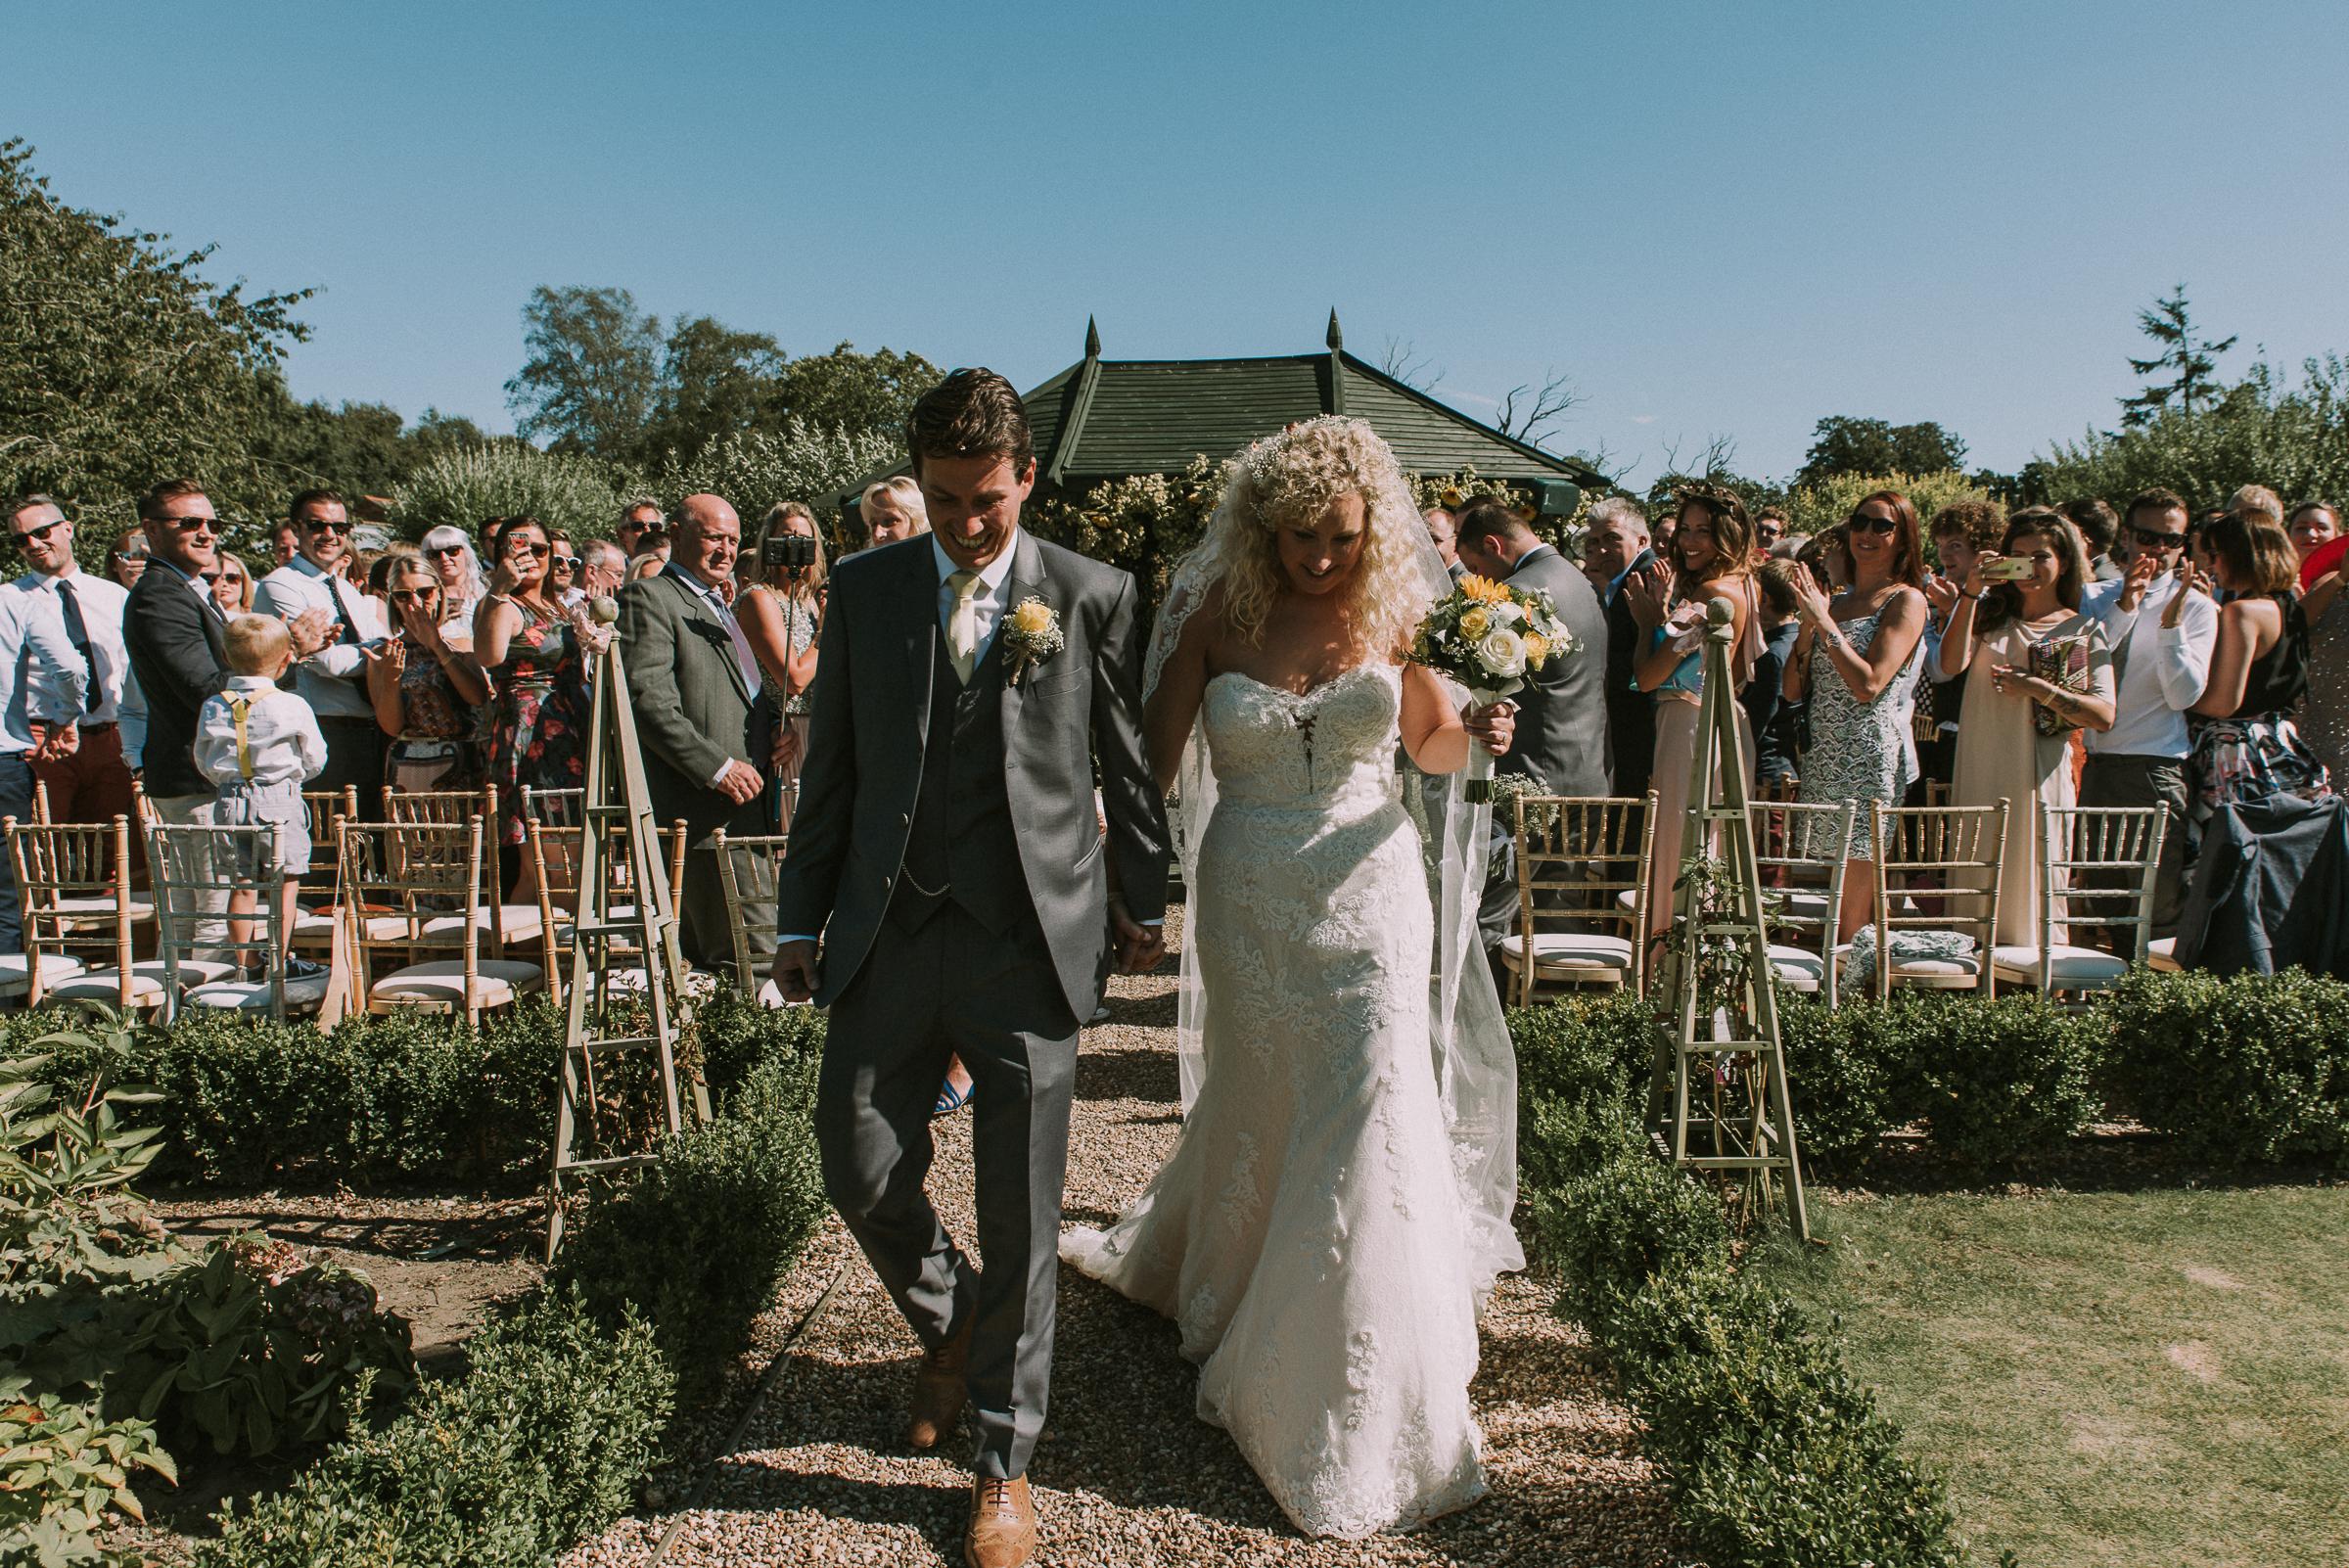 Festival Wedding Photography Secret Garden Maidstone Kent Jay Tunbridge Photorgaphic Co-34.jpg